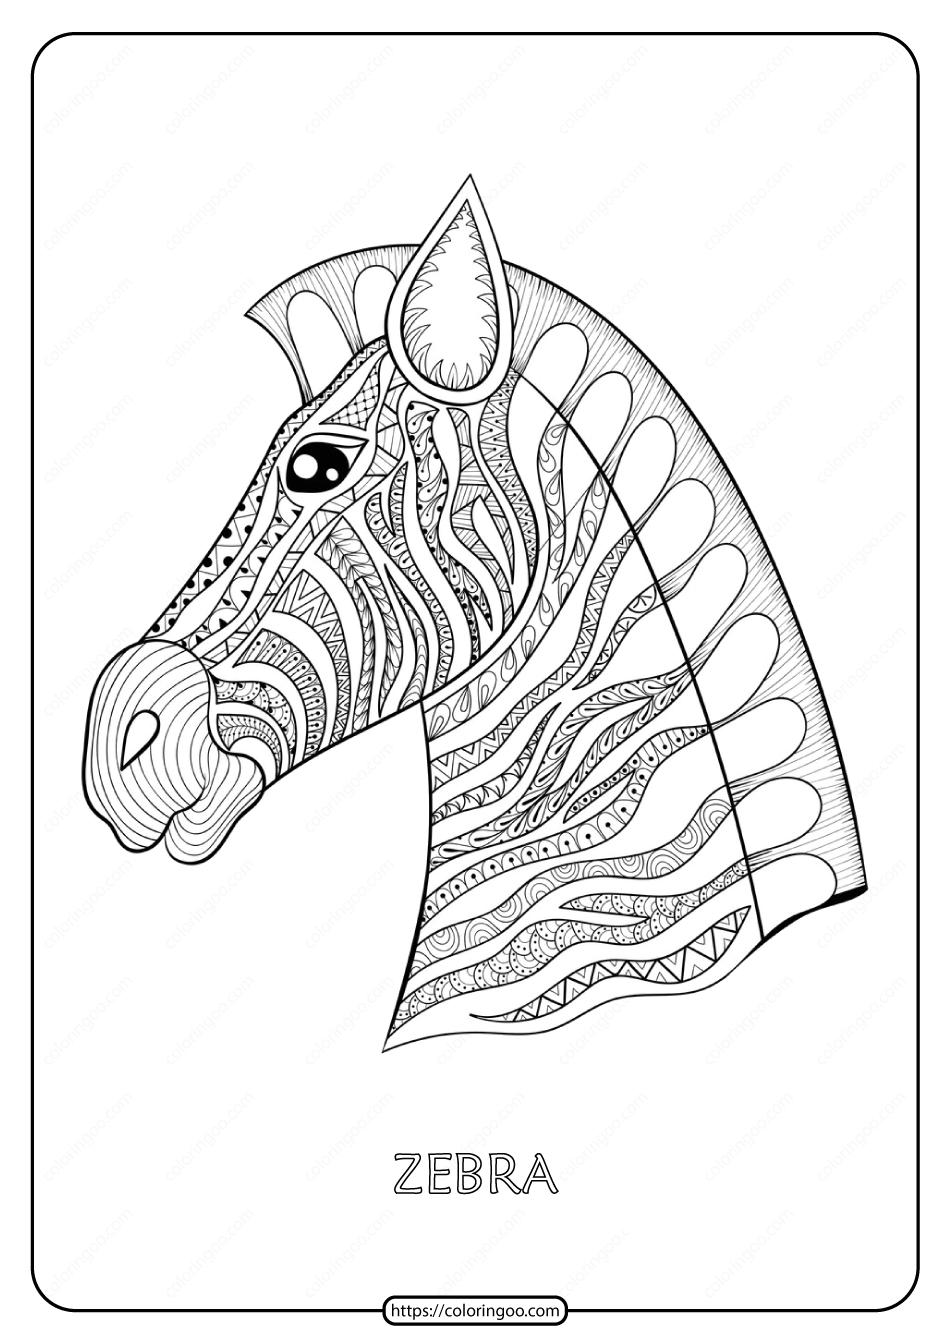 Free Printable Zebra Mandala Coloring Page